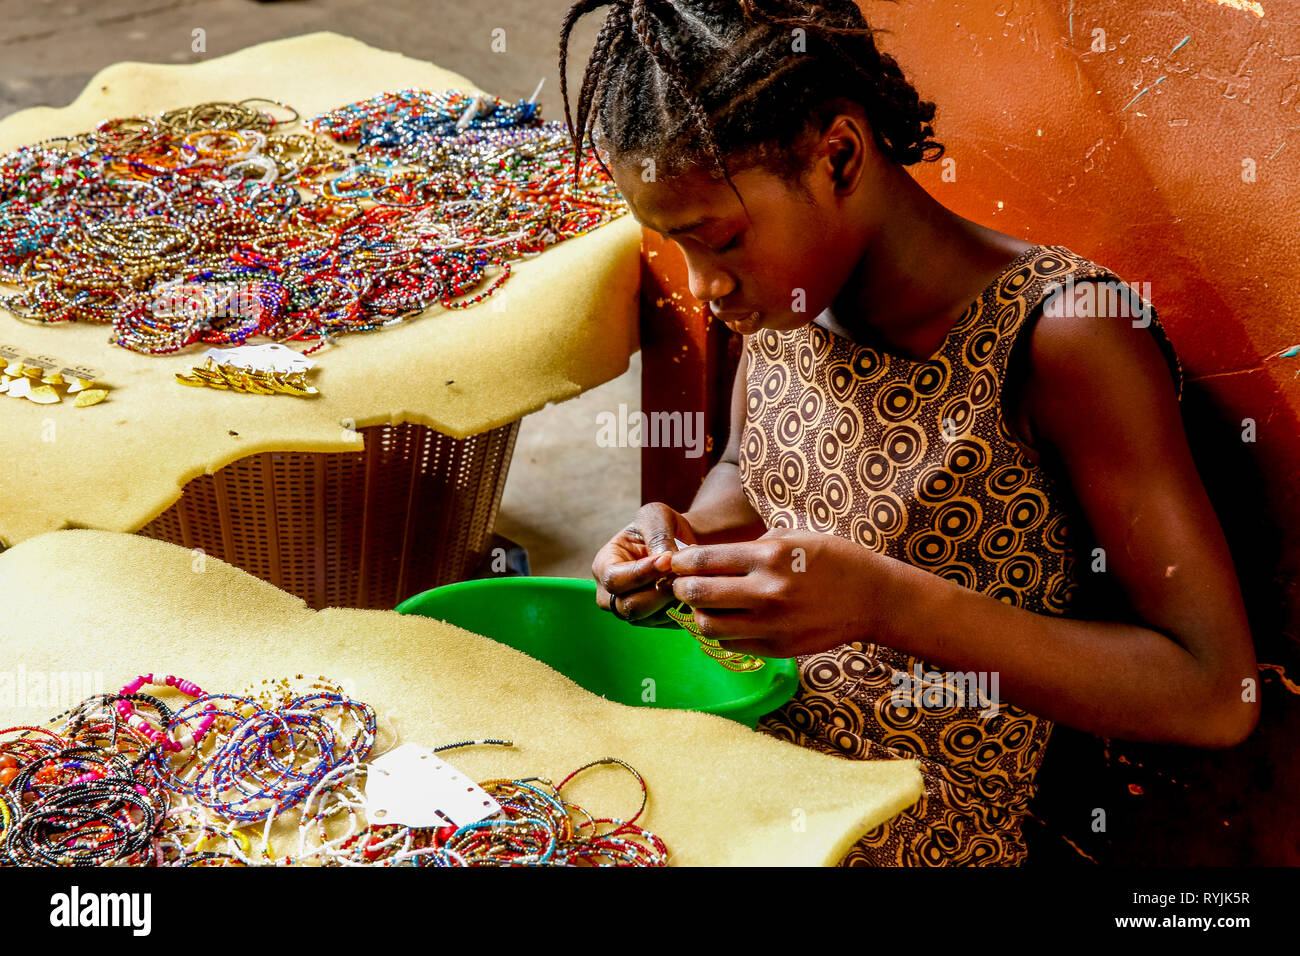 Girl making and selling jewelry in Ouagadougou, Burkina Faso